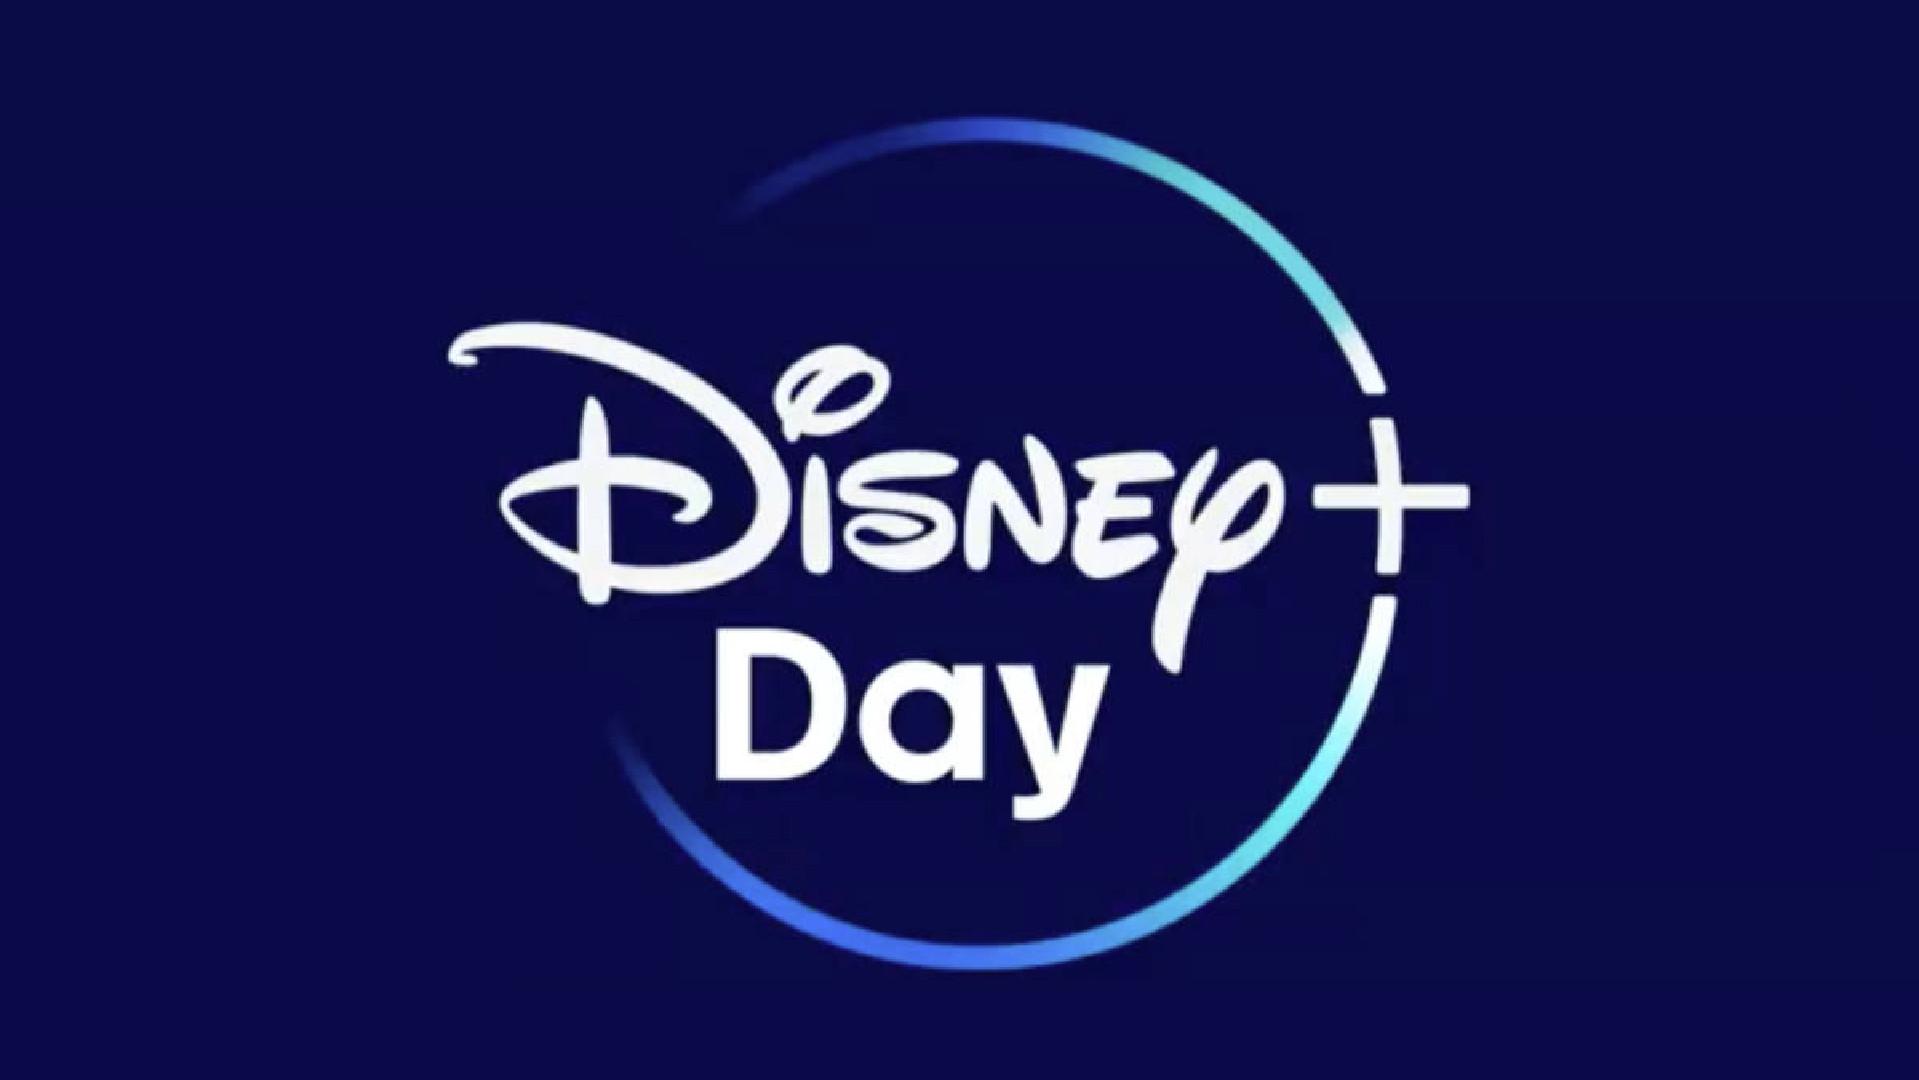 il logo del disney+ day - nerdface